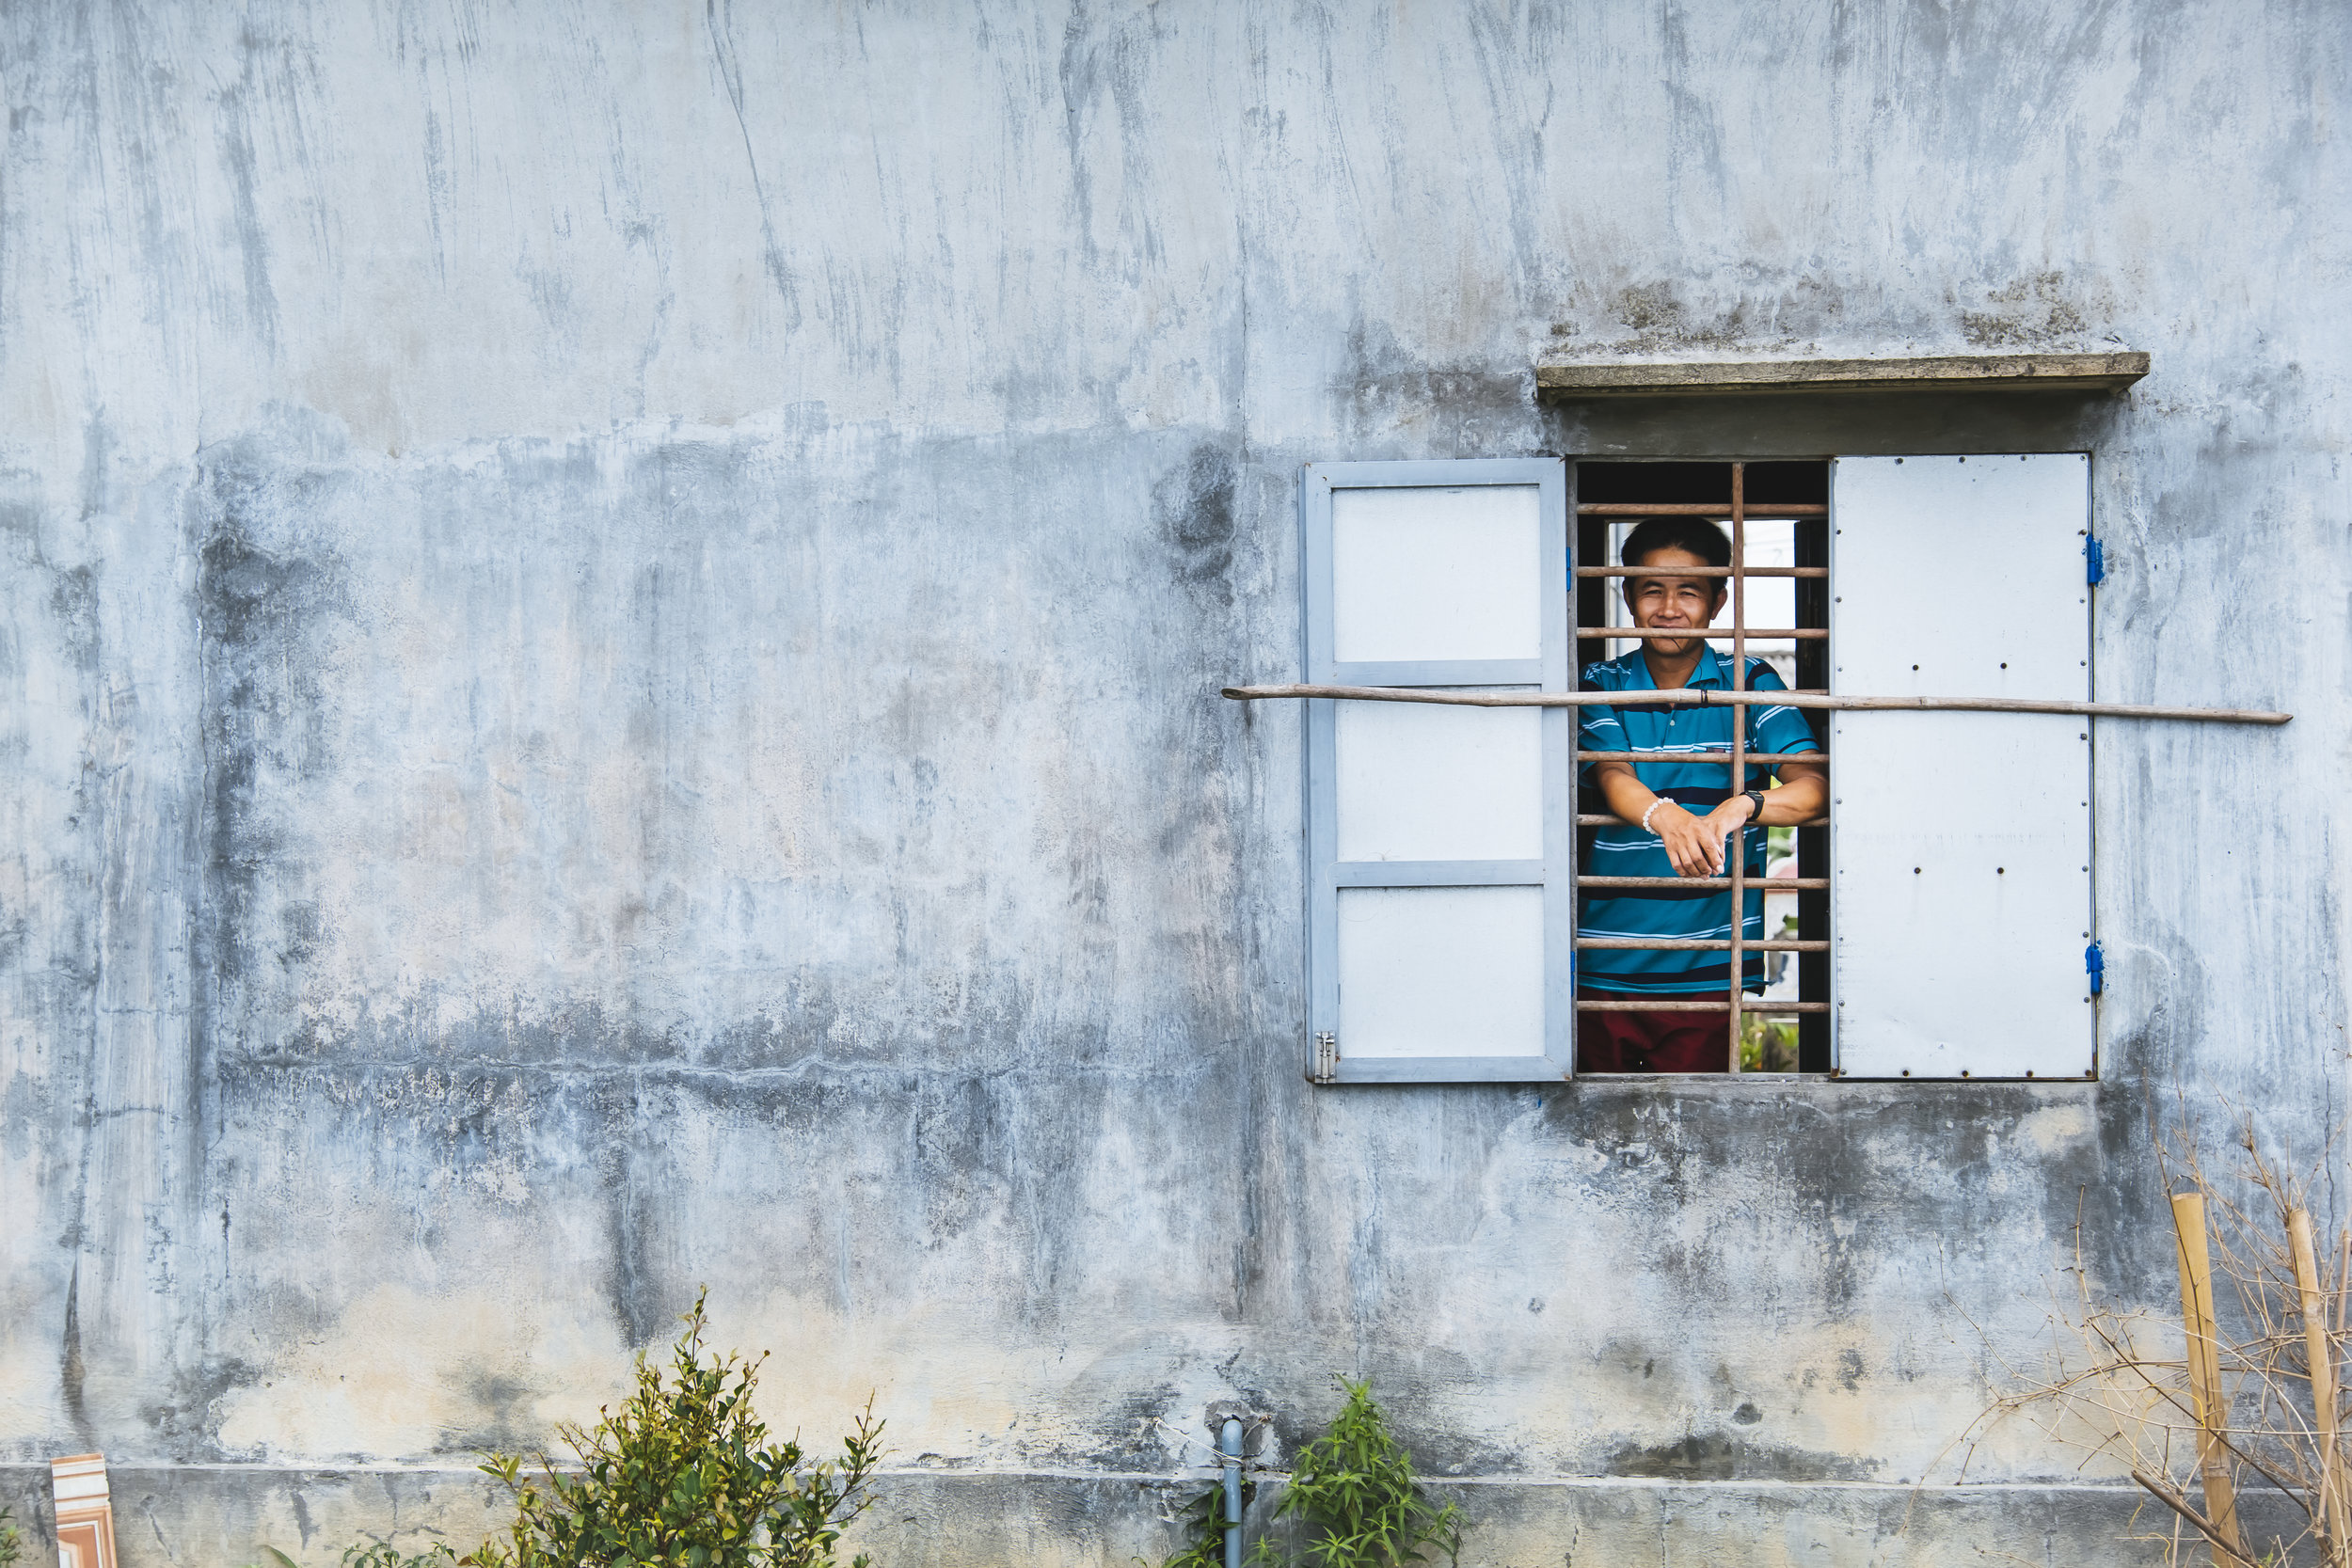 window-man.jpg